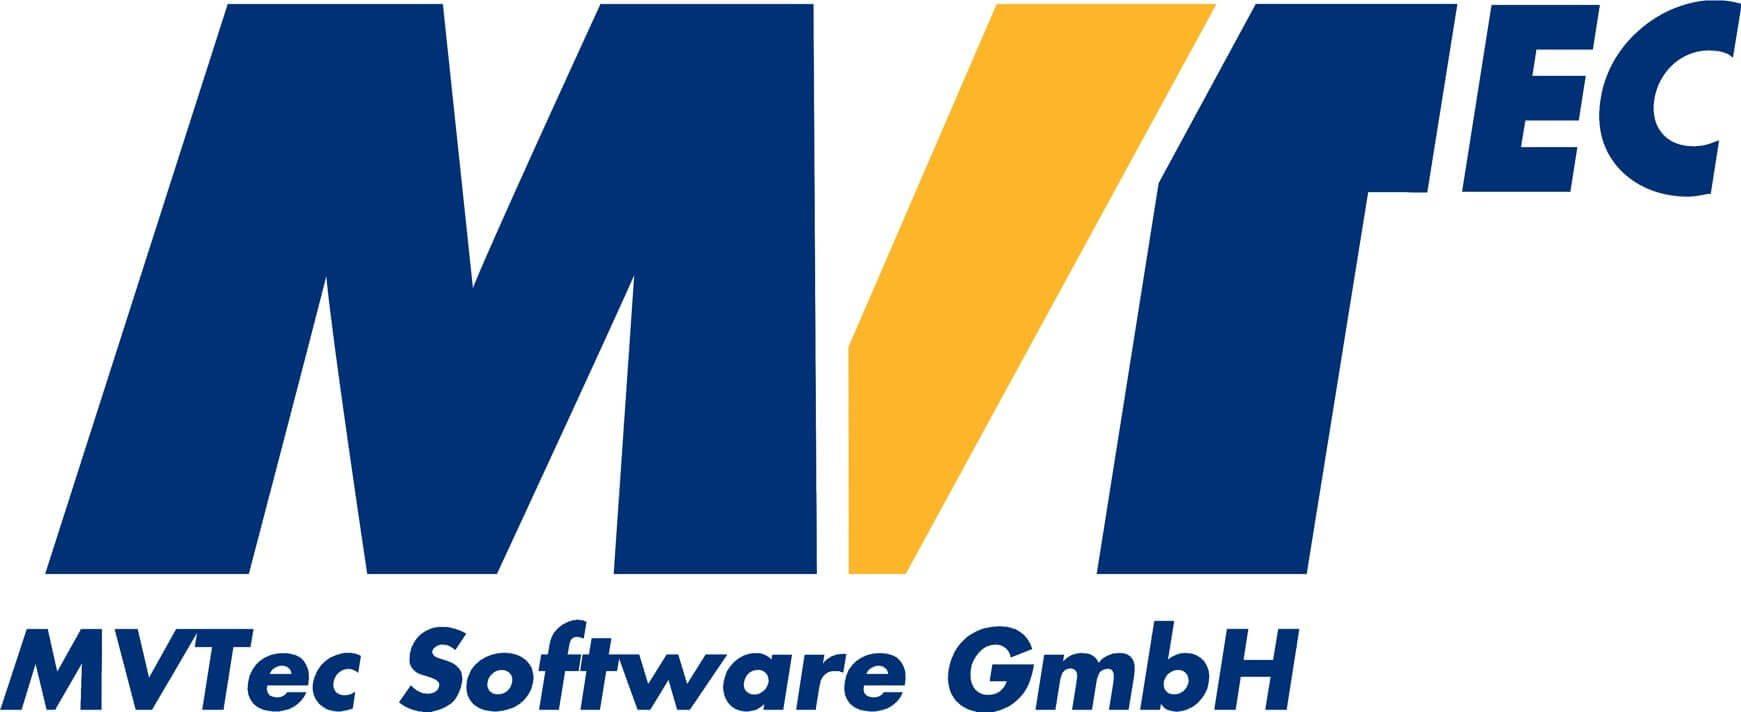 MVTec Software GmbH logo